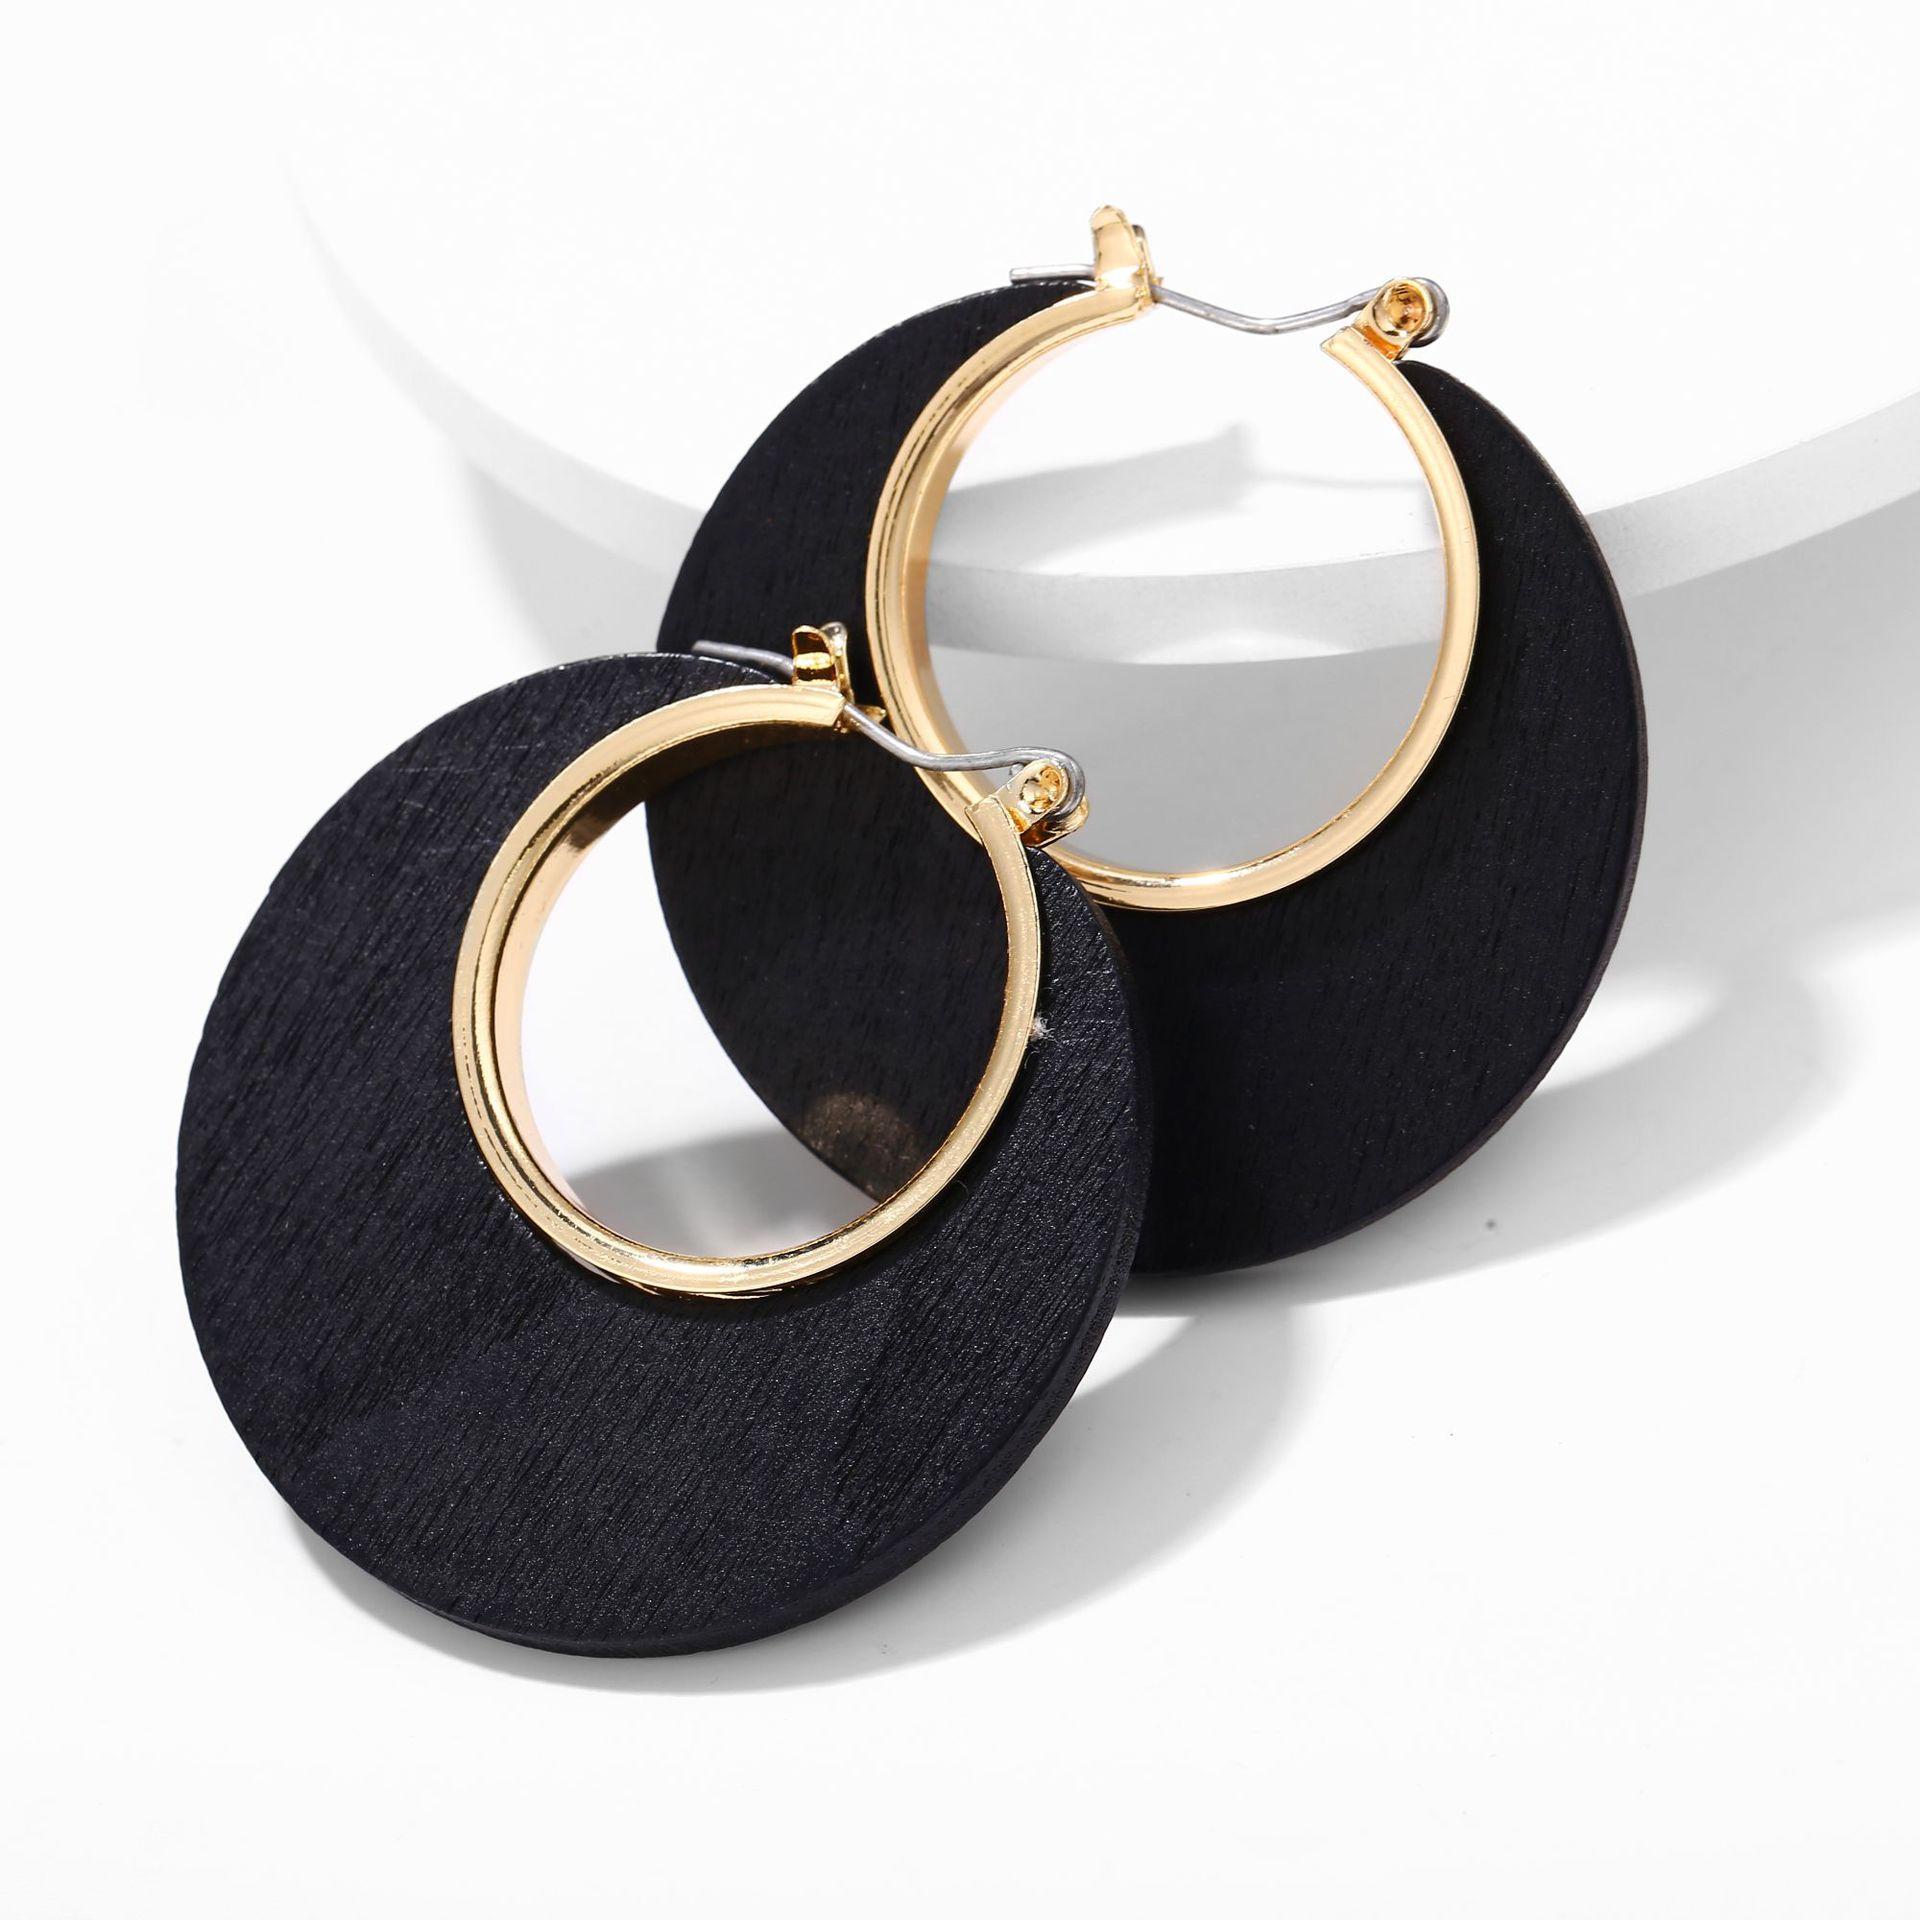 Creative retro simple classic solid color log C-shaped earrings NHPJ152903